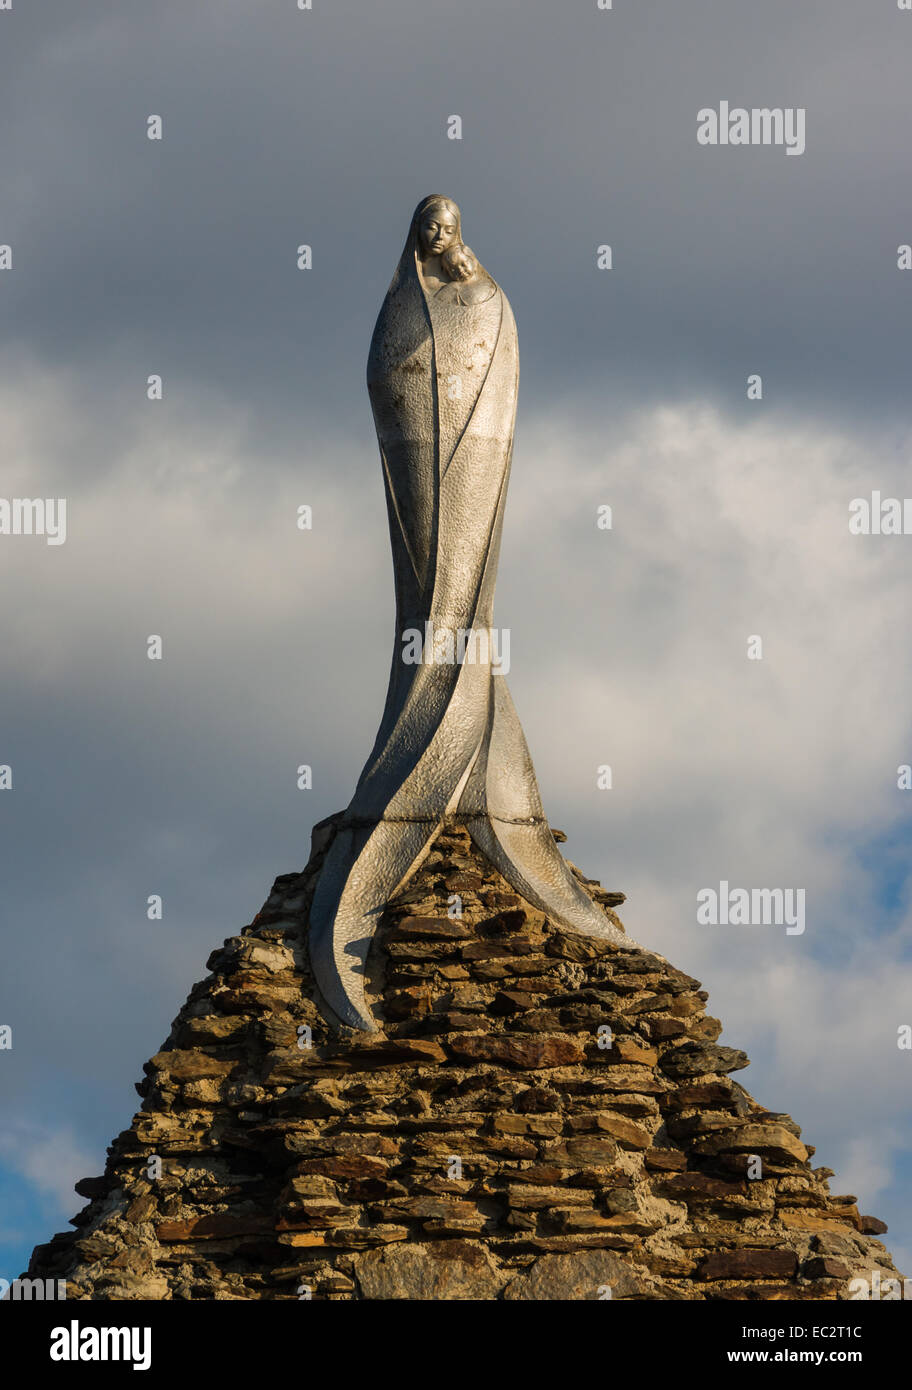 Our Lady of the Snows, 'Virgen de las Nieves', top statue by Francisco López Burgos, Sierra Nevada, - Stock Image